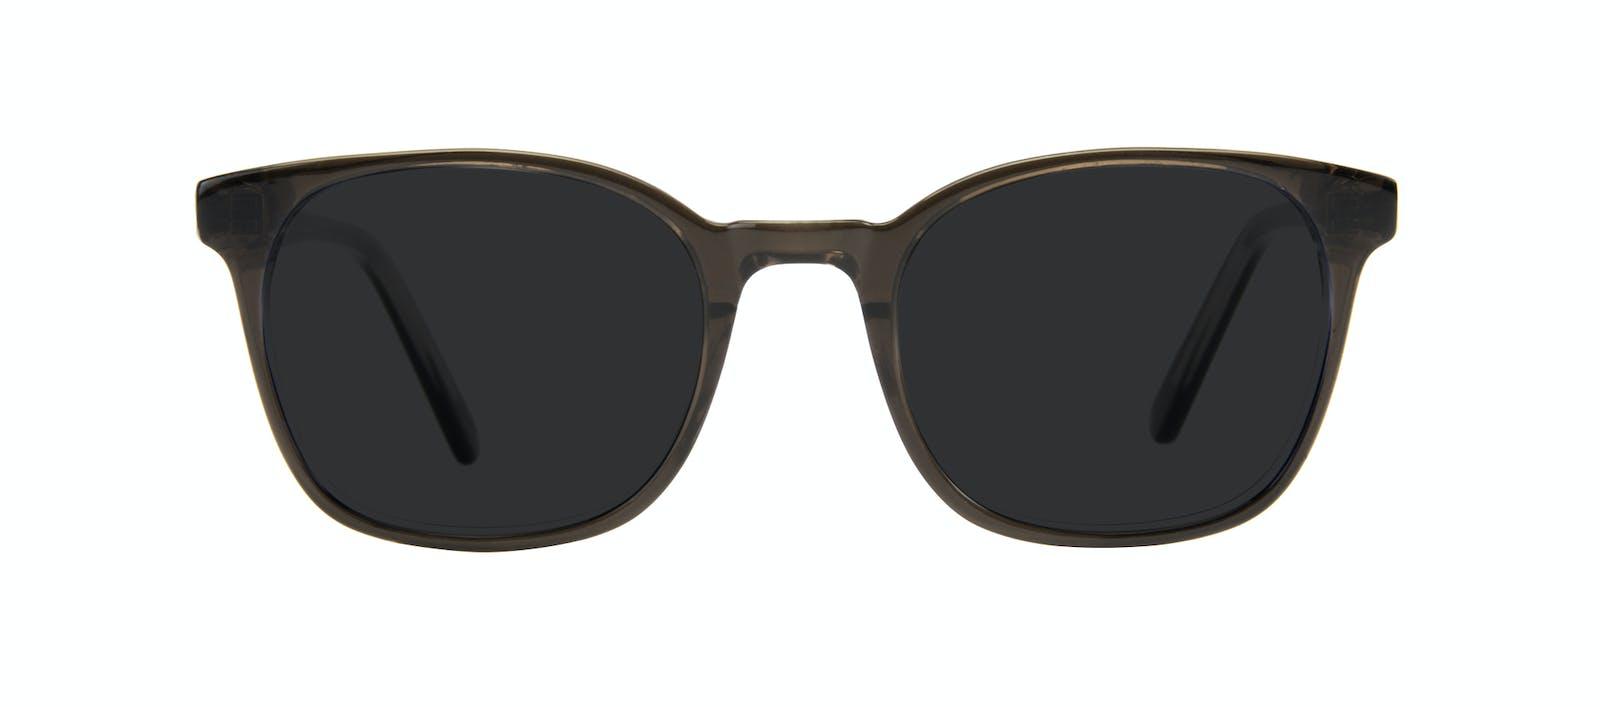 800dddc9b993 Affordable Fashion Glasses Rectangle Square Sunglasses Men Peak Black Ice  Front